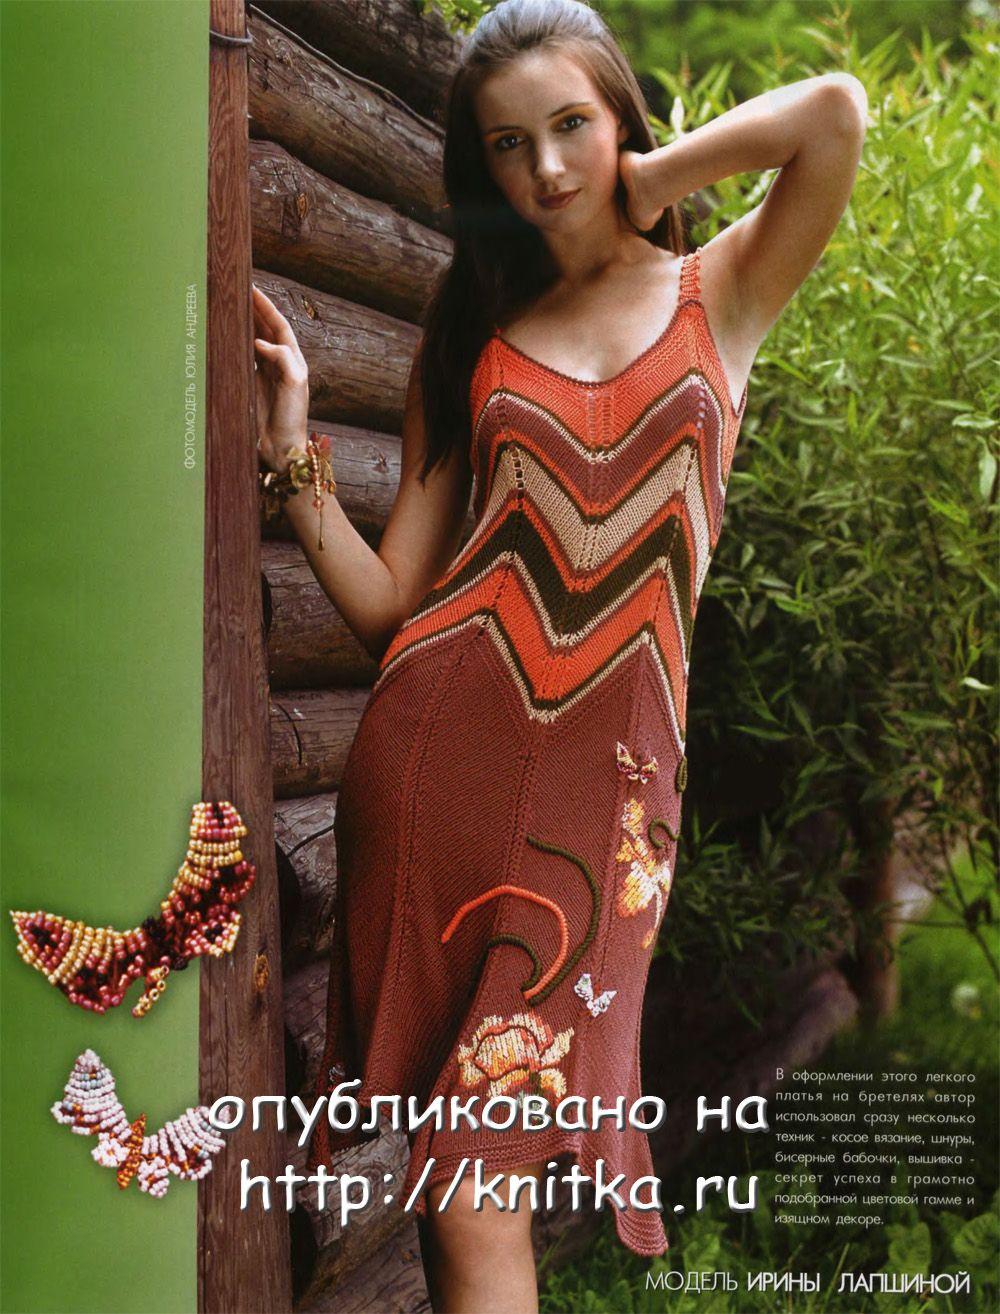 http://knitka.ru/knitting-schemes-pictures/2010/04/platiej1.jpg